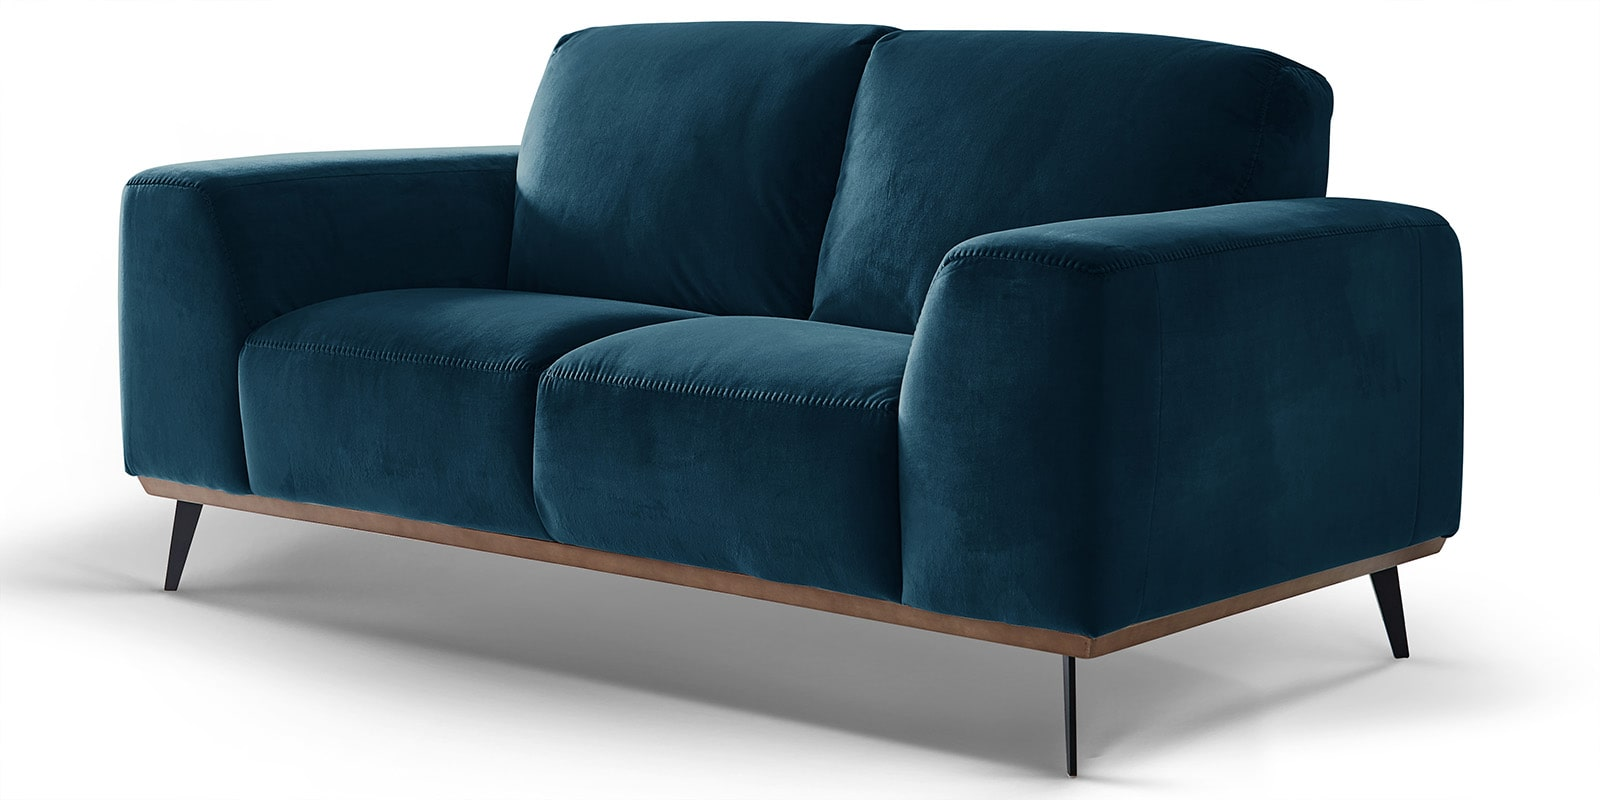 Moebella24 - 2-Sitzer - Sofa - Barcelona - Samt - Türkis - Skandinavisches - Design - Punto - cavallo - Nähte - Detailaufnahme